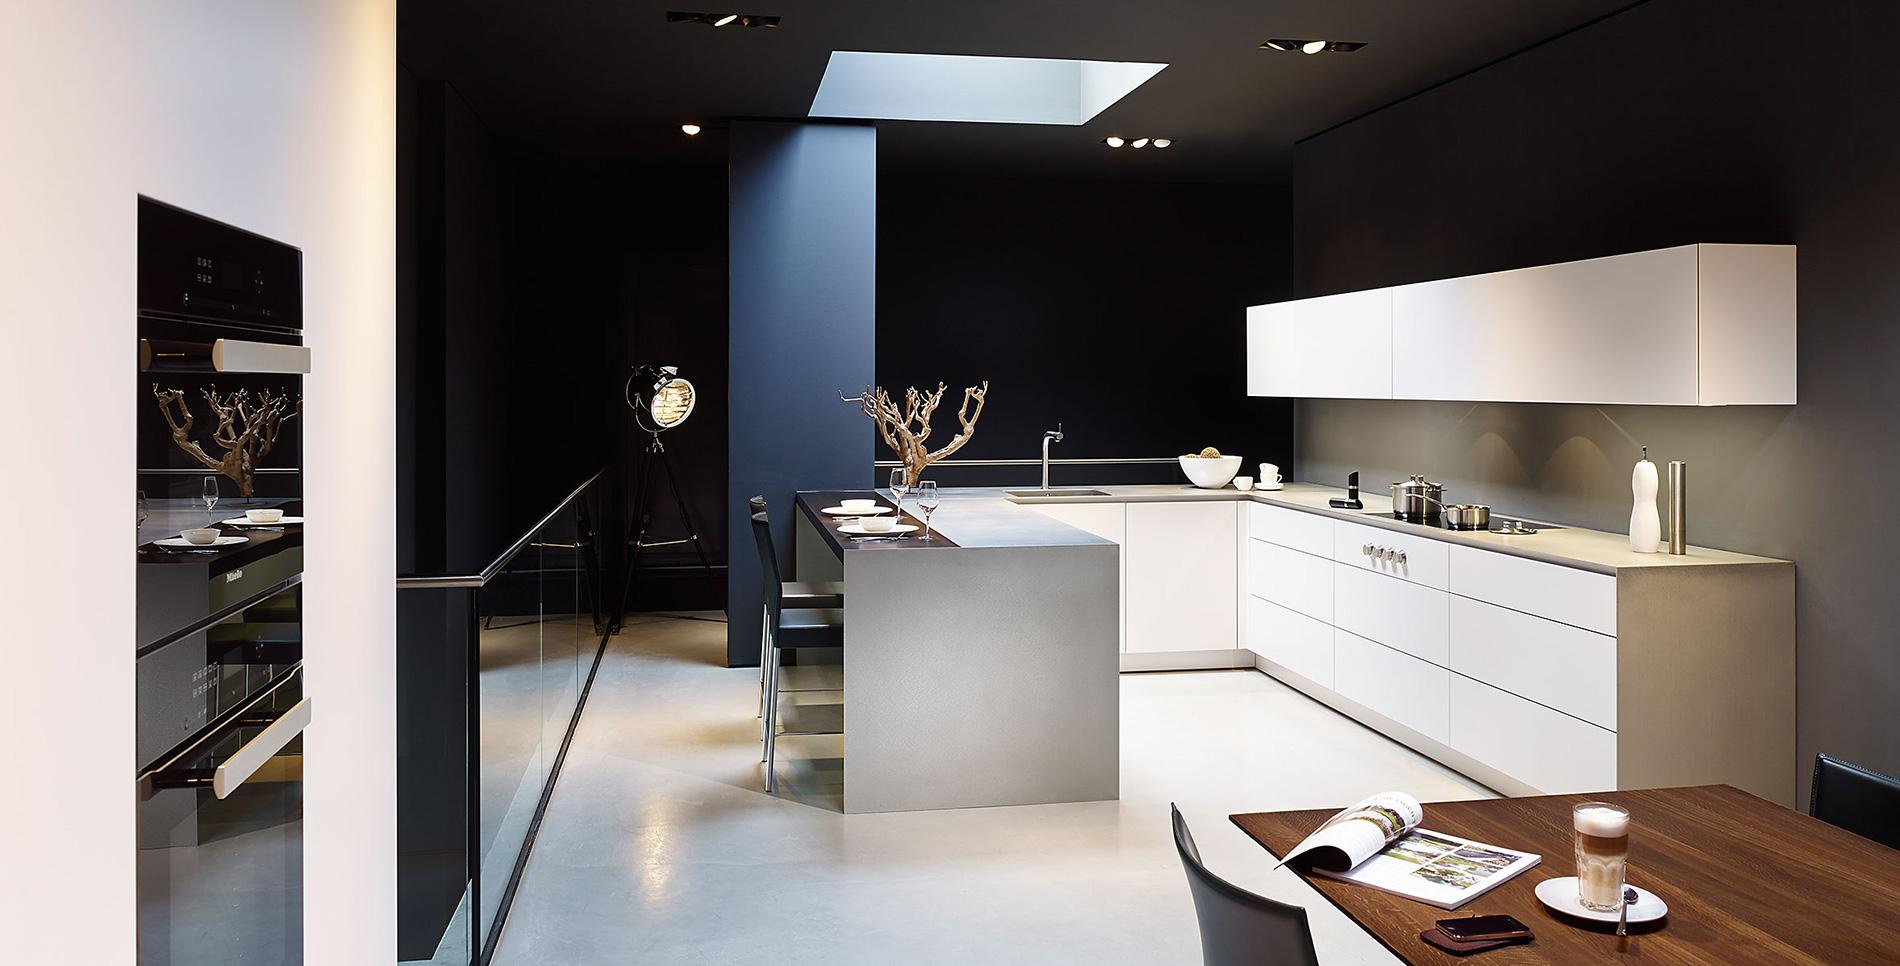 k chen nicole zimmermann fotodesign. Black Bedroom Furniture Sets. Home Design Ideas